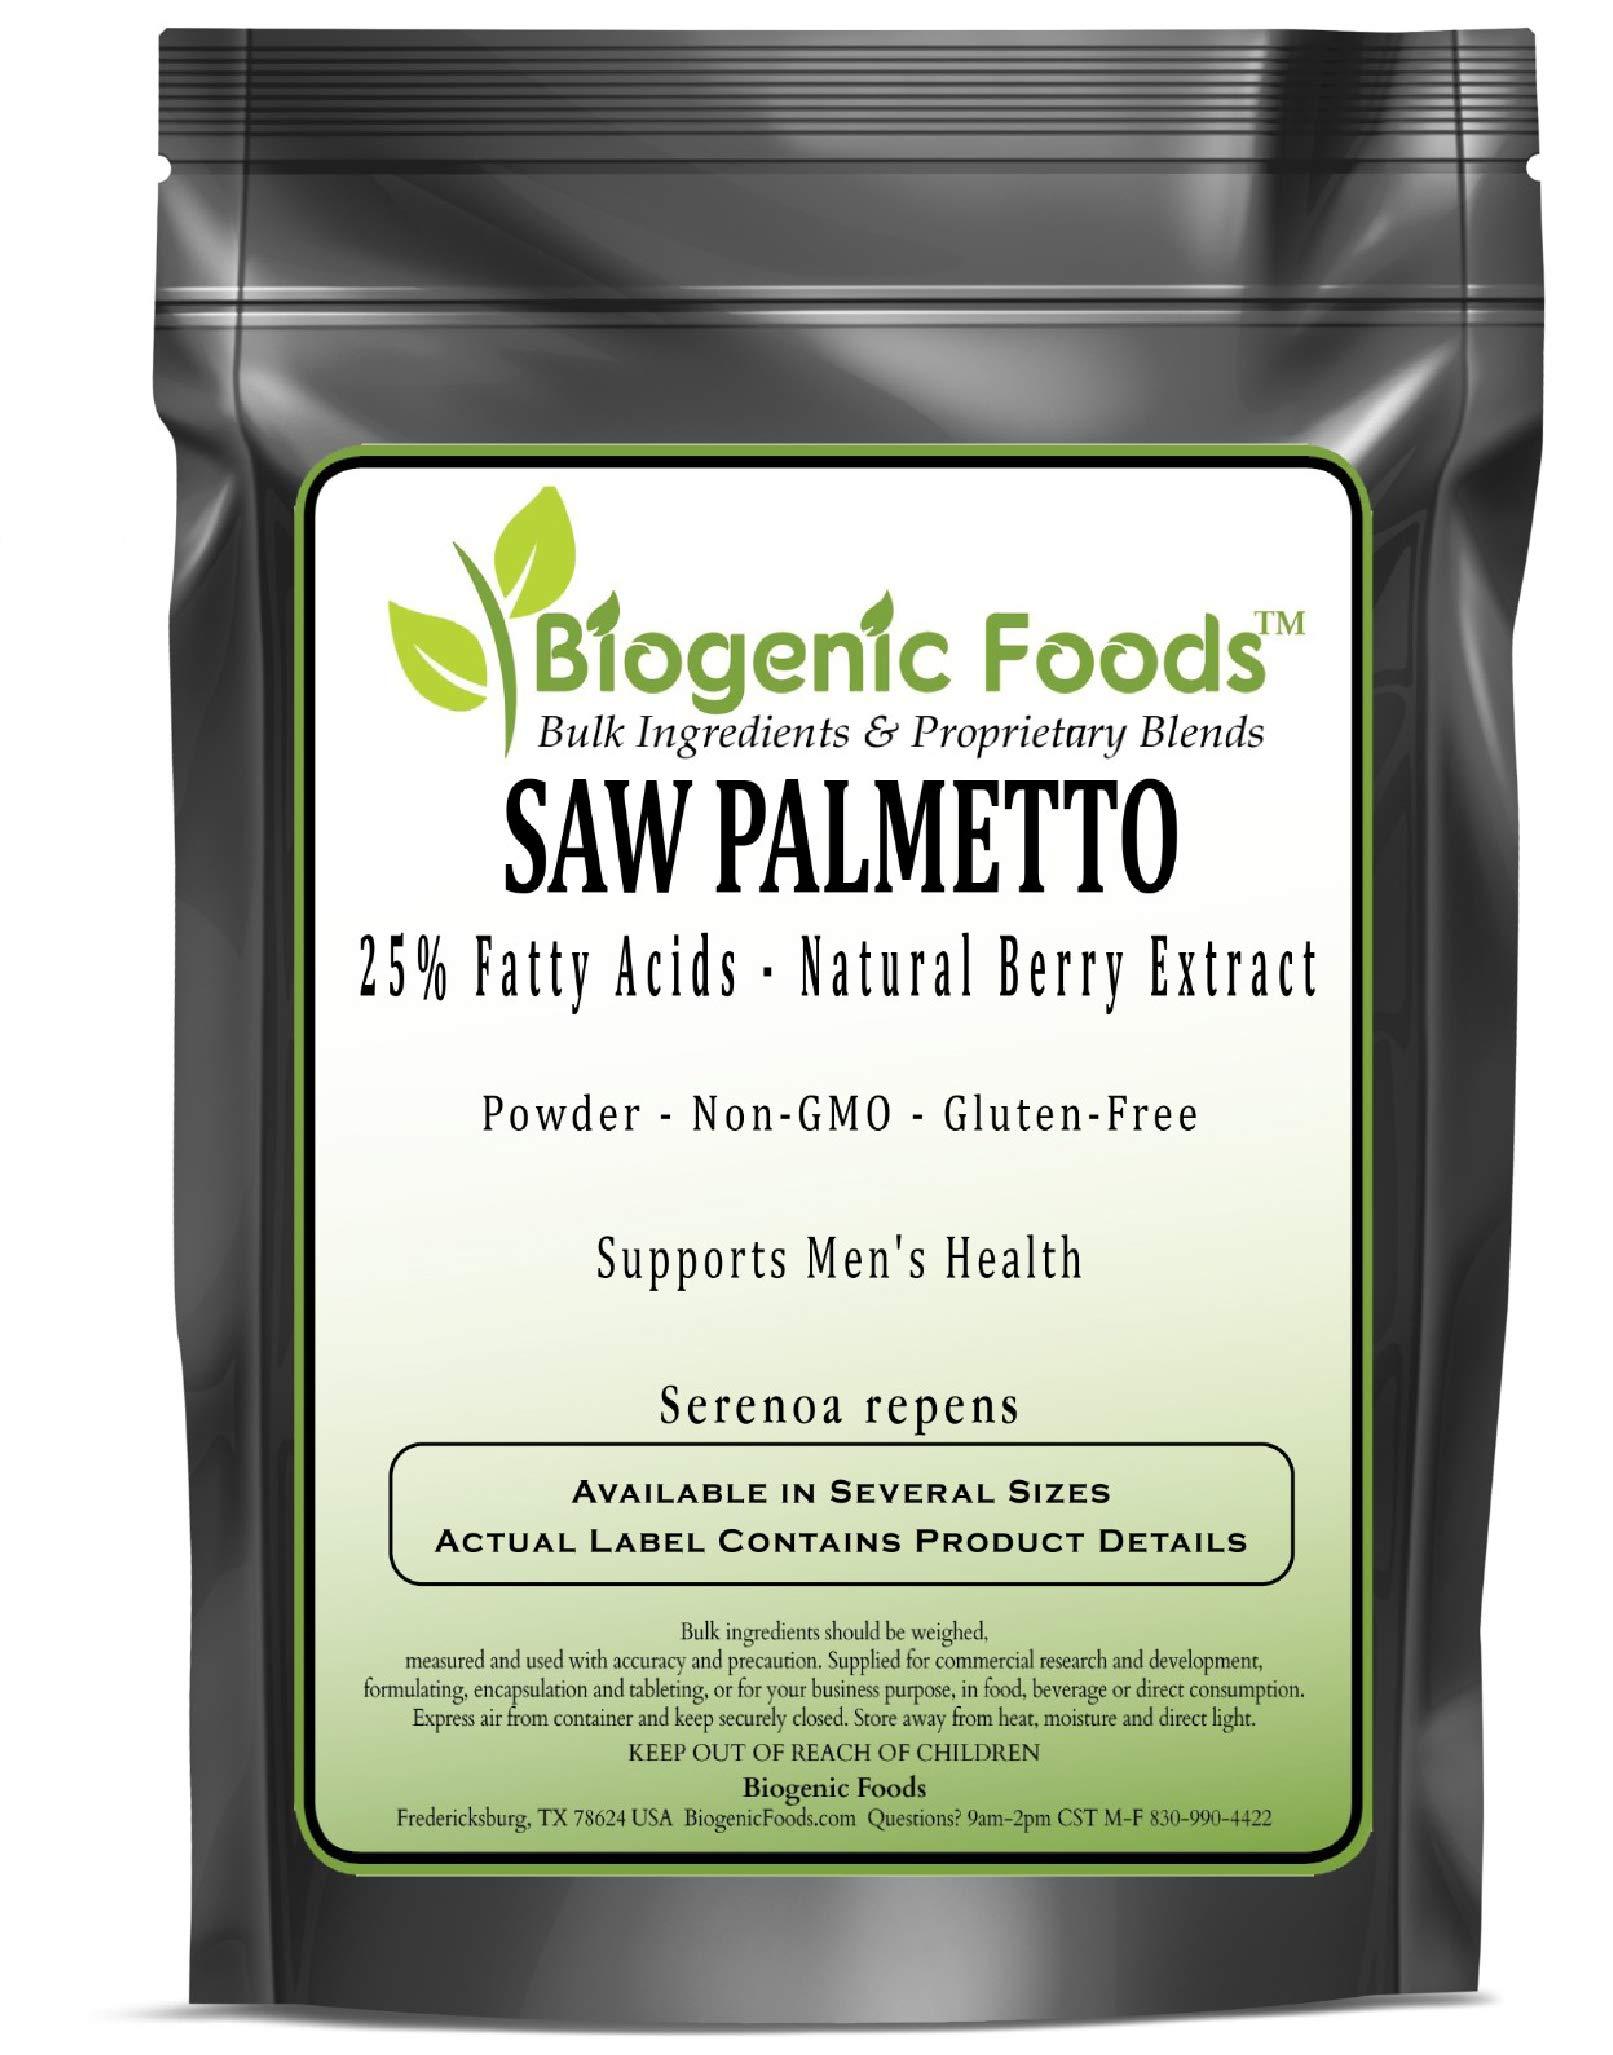 Saw Palmetto - 25% Fatty Acids - Natural Berry Powder Extract (Serenoa repens), 5 kg